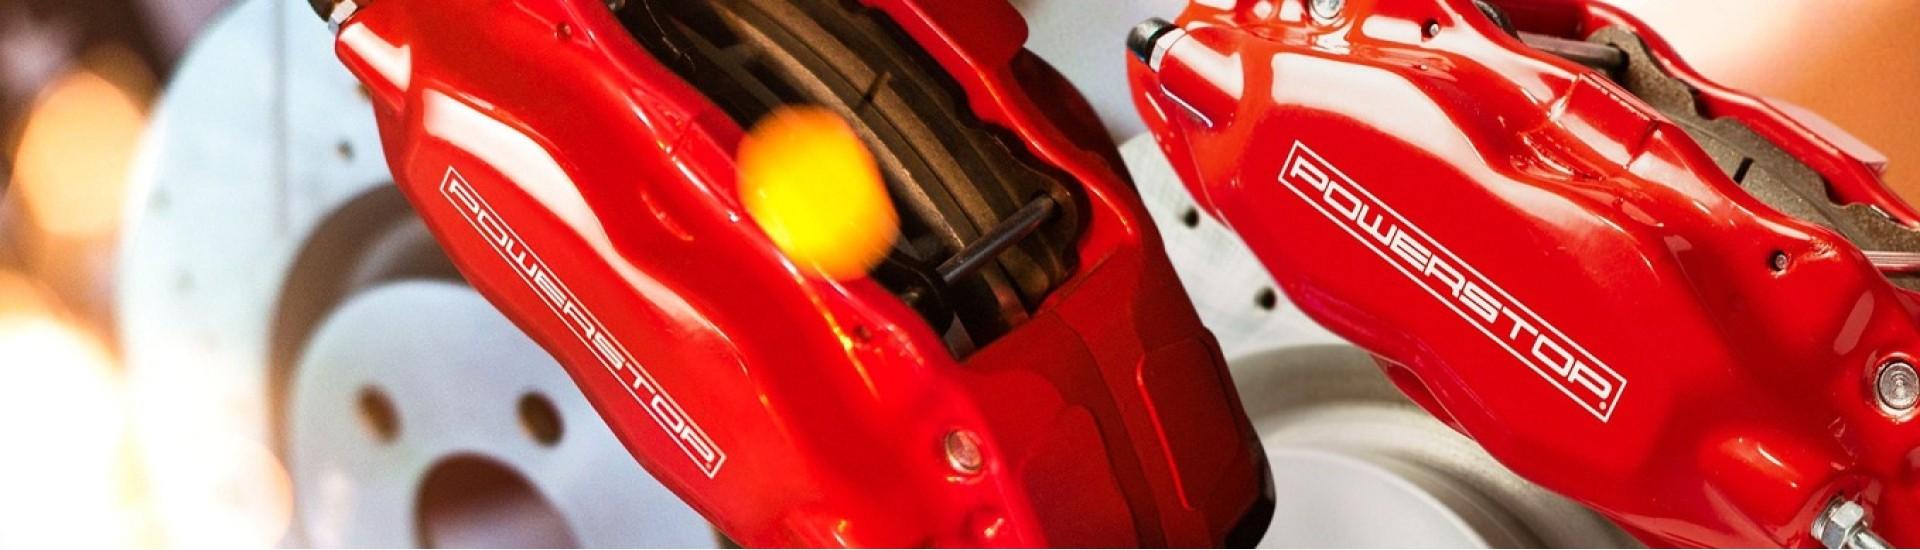 لوازم ترمز ، performance brakes, pads, rotors